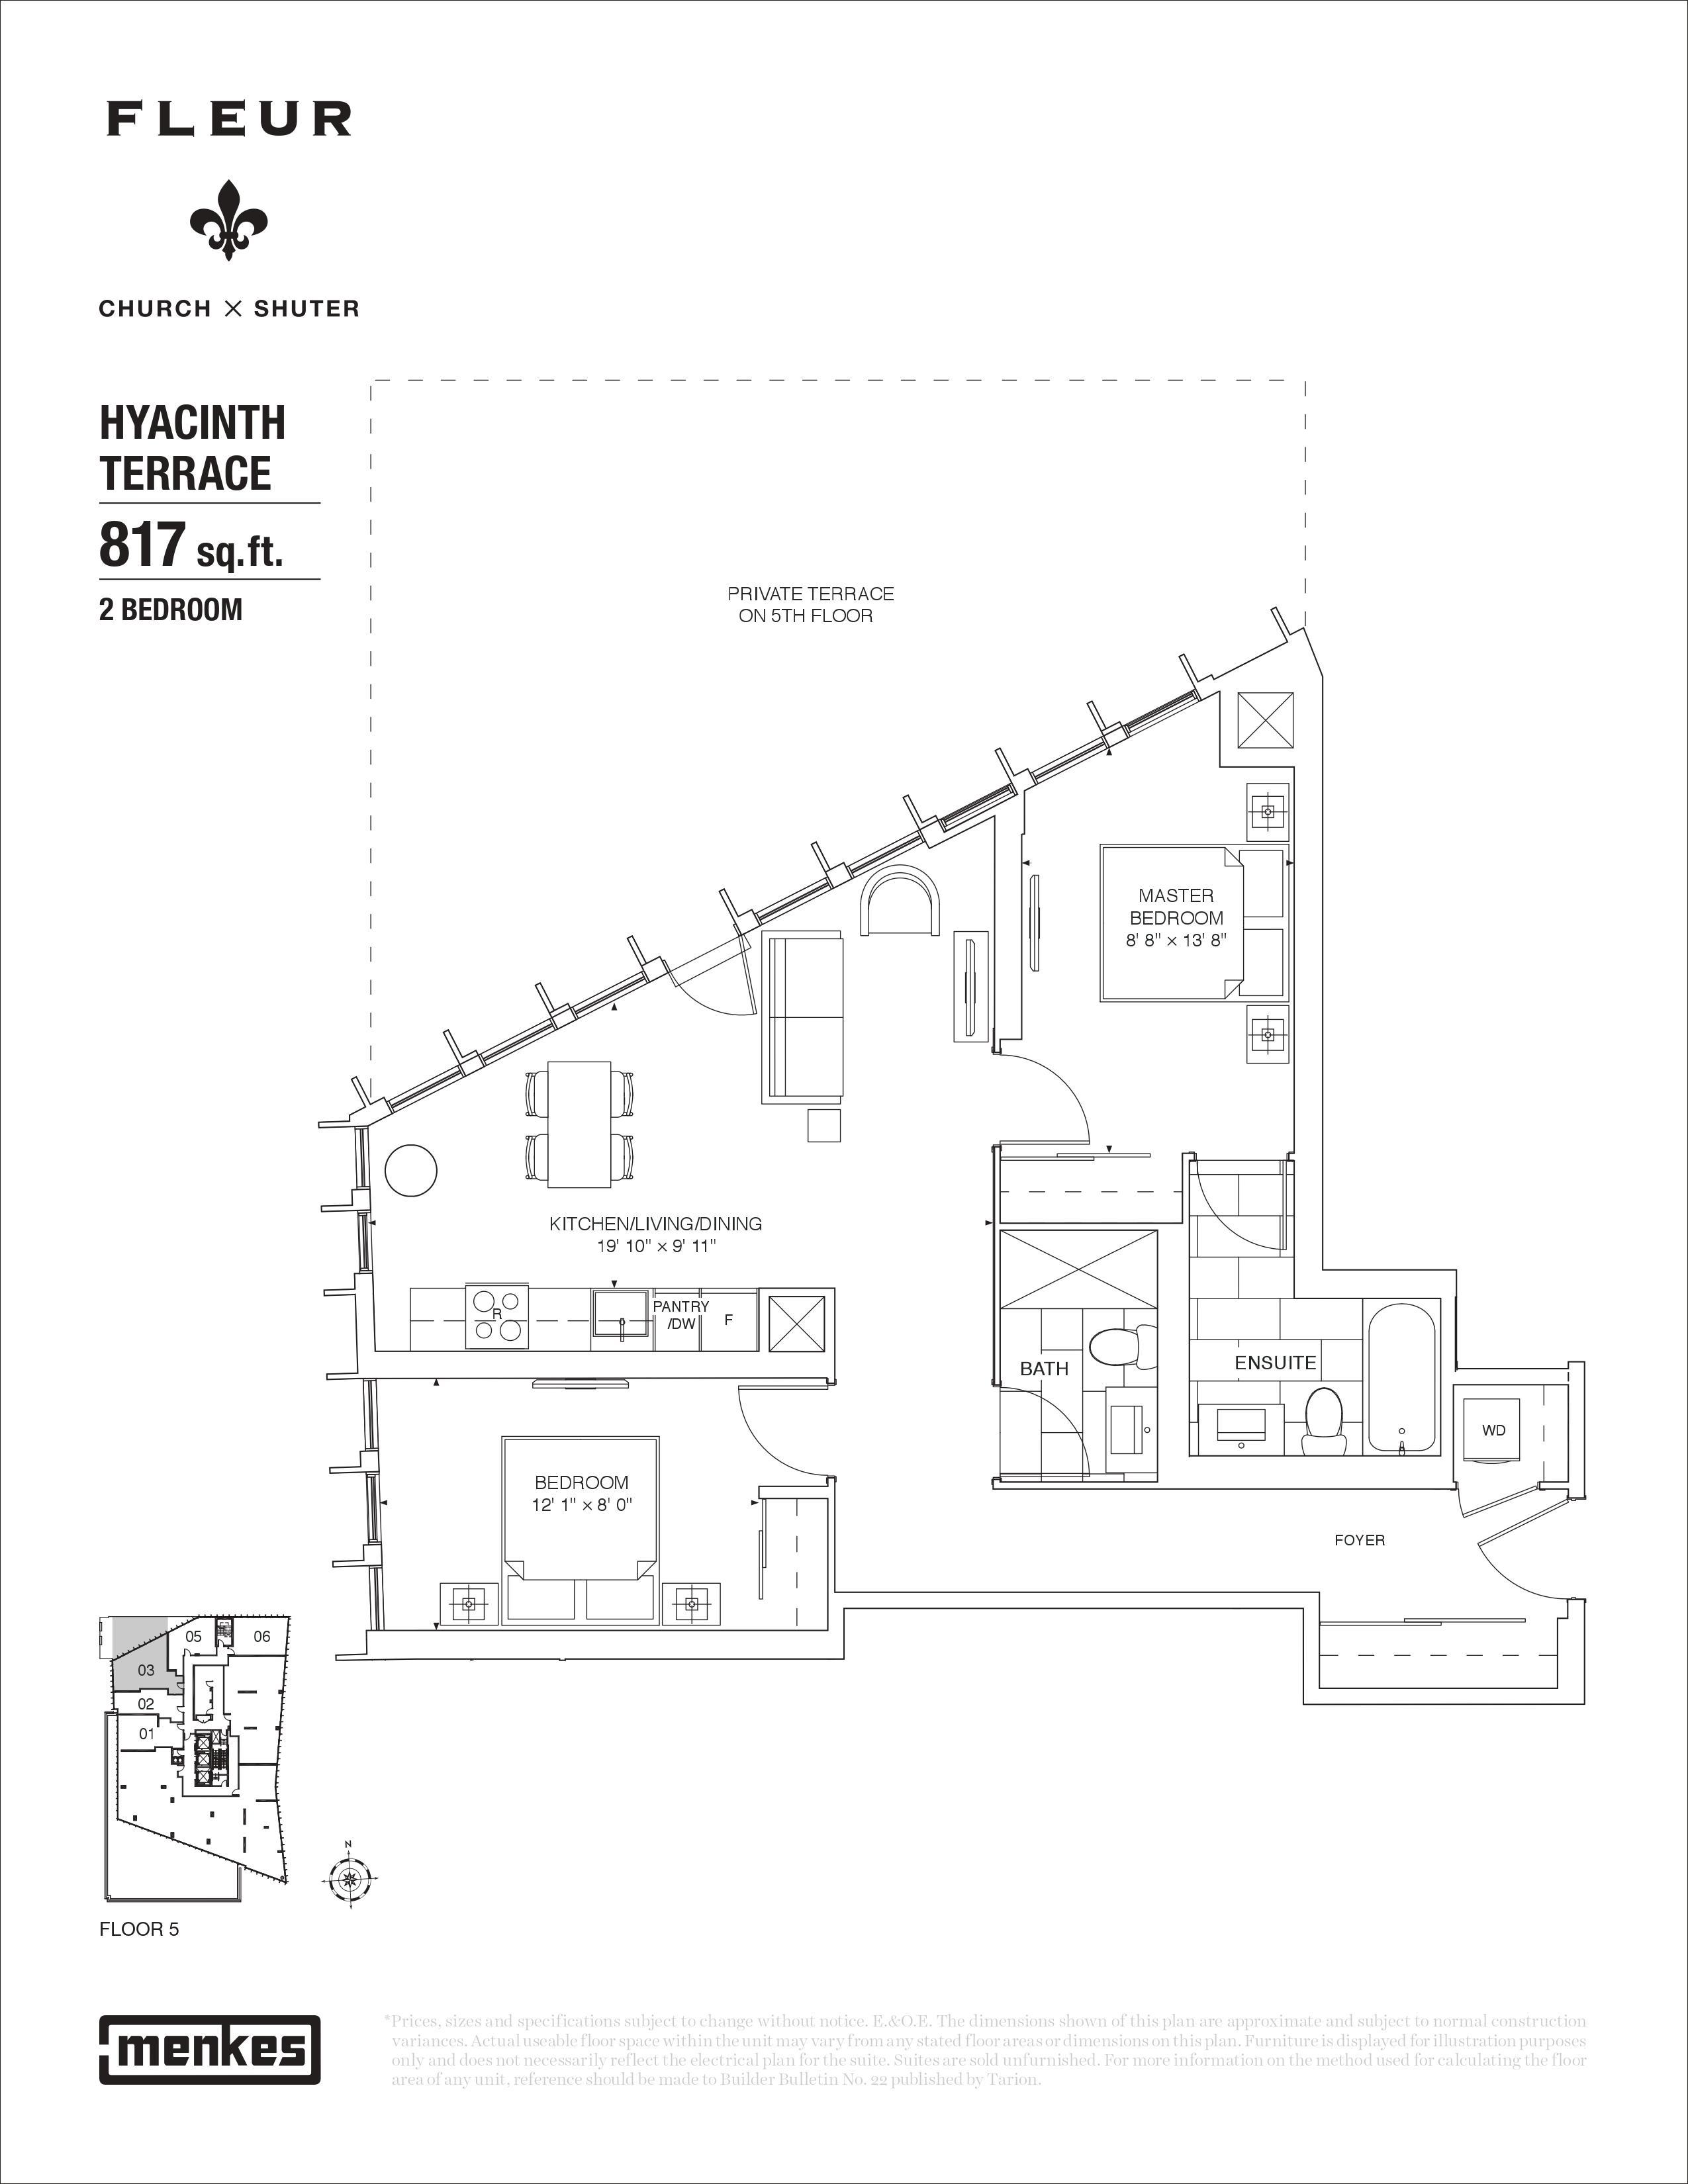 Hyacinth Terrace